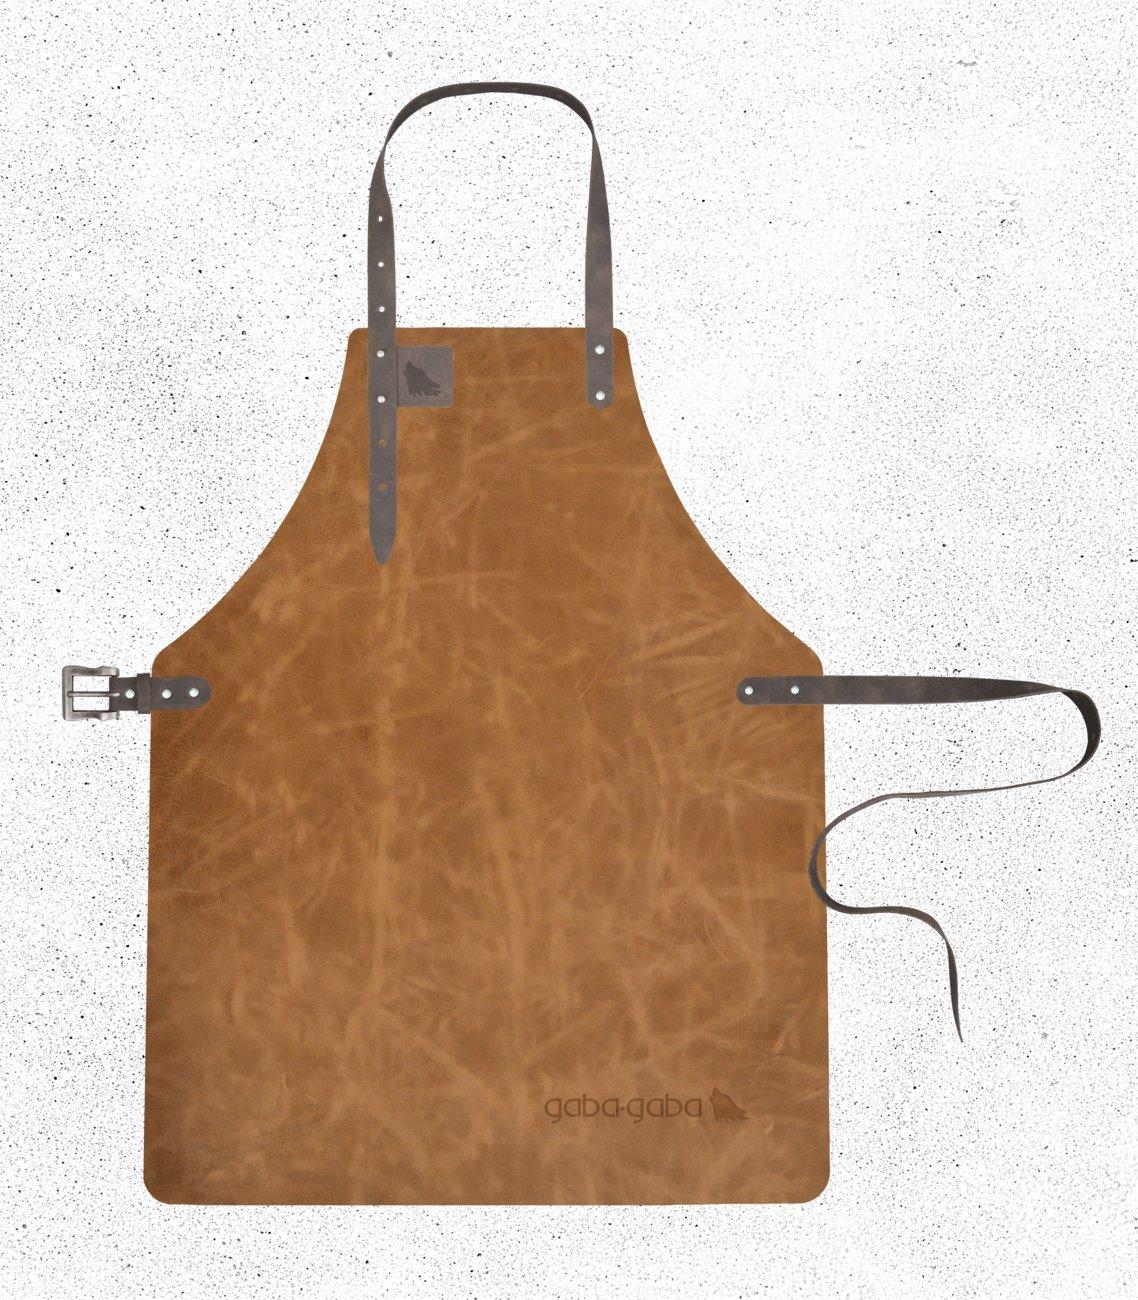 Gaba Gaba - Grillschürze / Lederschürze / Kellnerschürze aus Leder (geeignet für Barista, Gastronomie & Grillen) - Gazelle - Hippo (Ockerbraun) - XL - 62,5 x 90cm